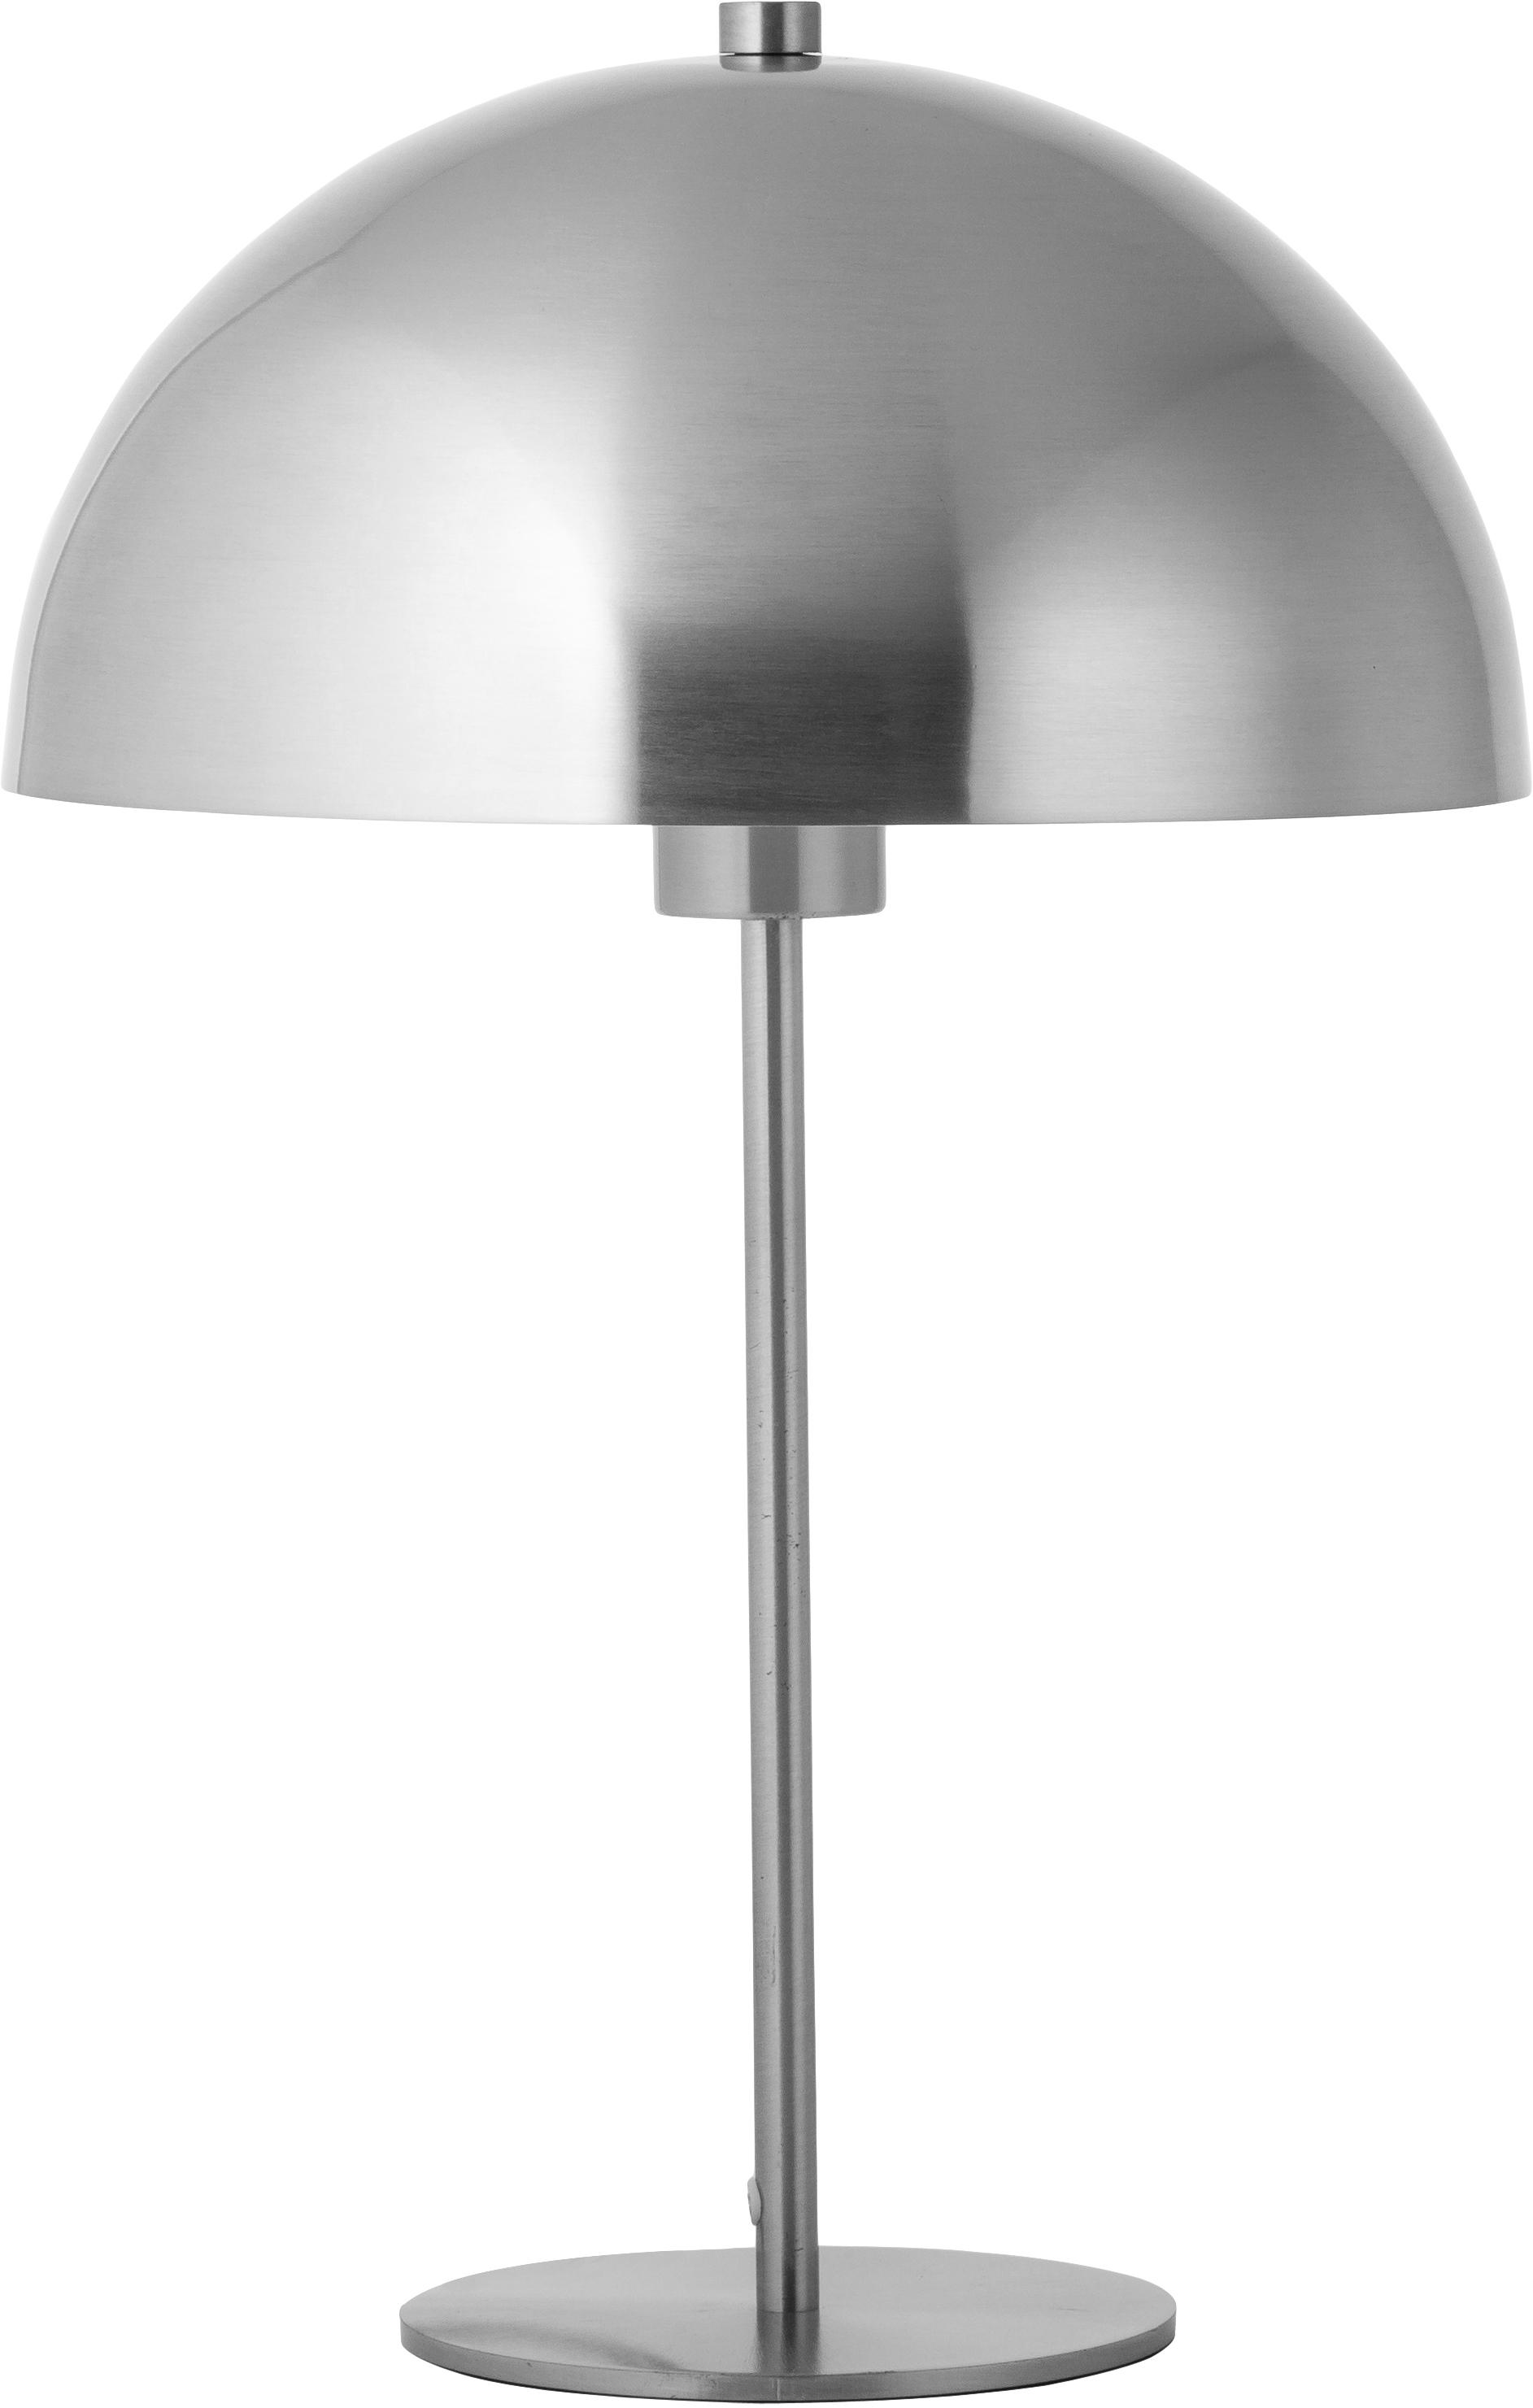 Lámpara de mesa de metal Matilda, Pantalla: metal niquelado, Níquel, Ø 29 x Al 45 cm